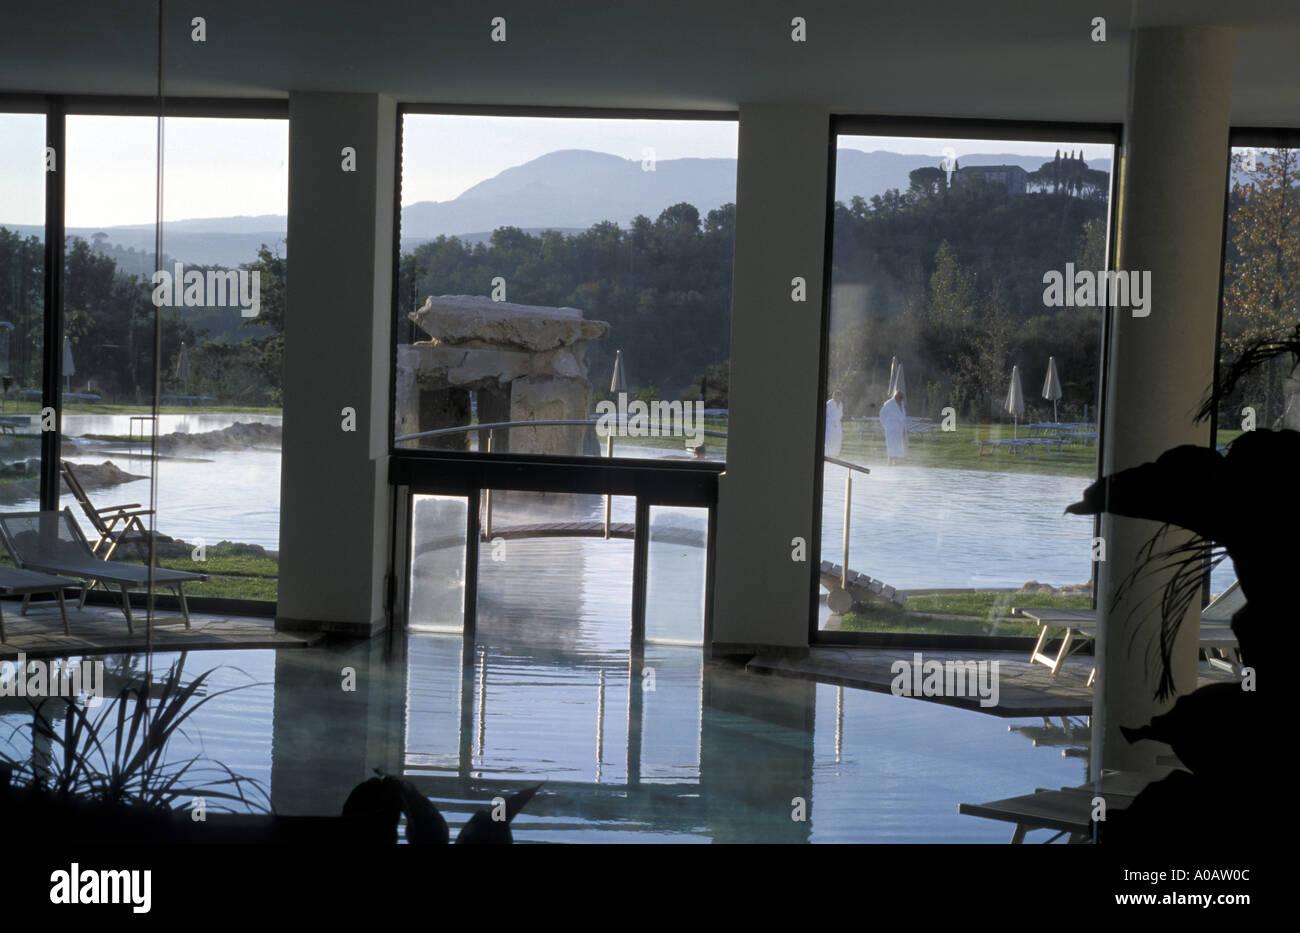 https://c8.alamy.com/compit/a0aw0c/piscina-themal-adler-thermae-bagno-vignoni-toscana-italia-a0aw0c.jpg